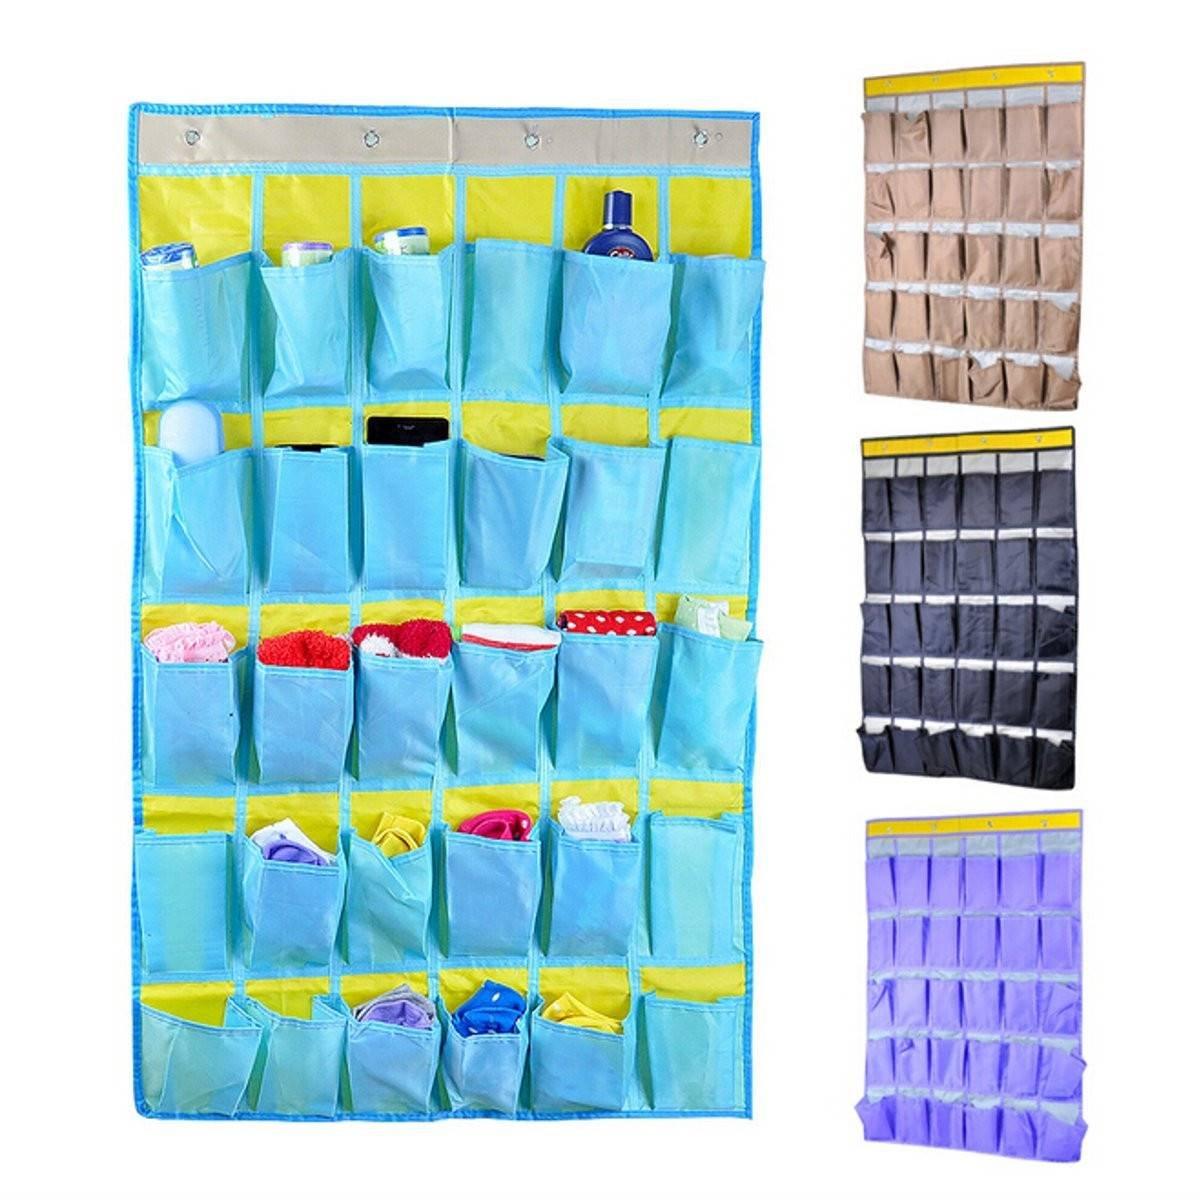 Bazaar 30Pockets Oxford Home Door Wall Hanging Hook Sundries Organizer Holder Rack Shoes Scoks Ties Cloth Storage Bag